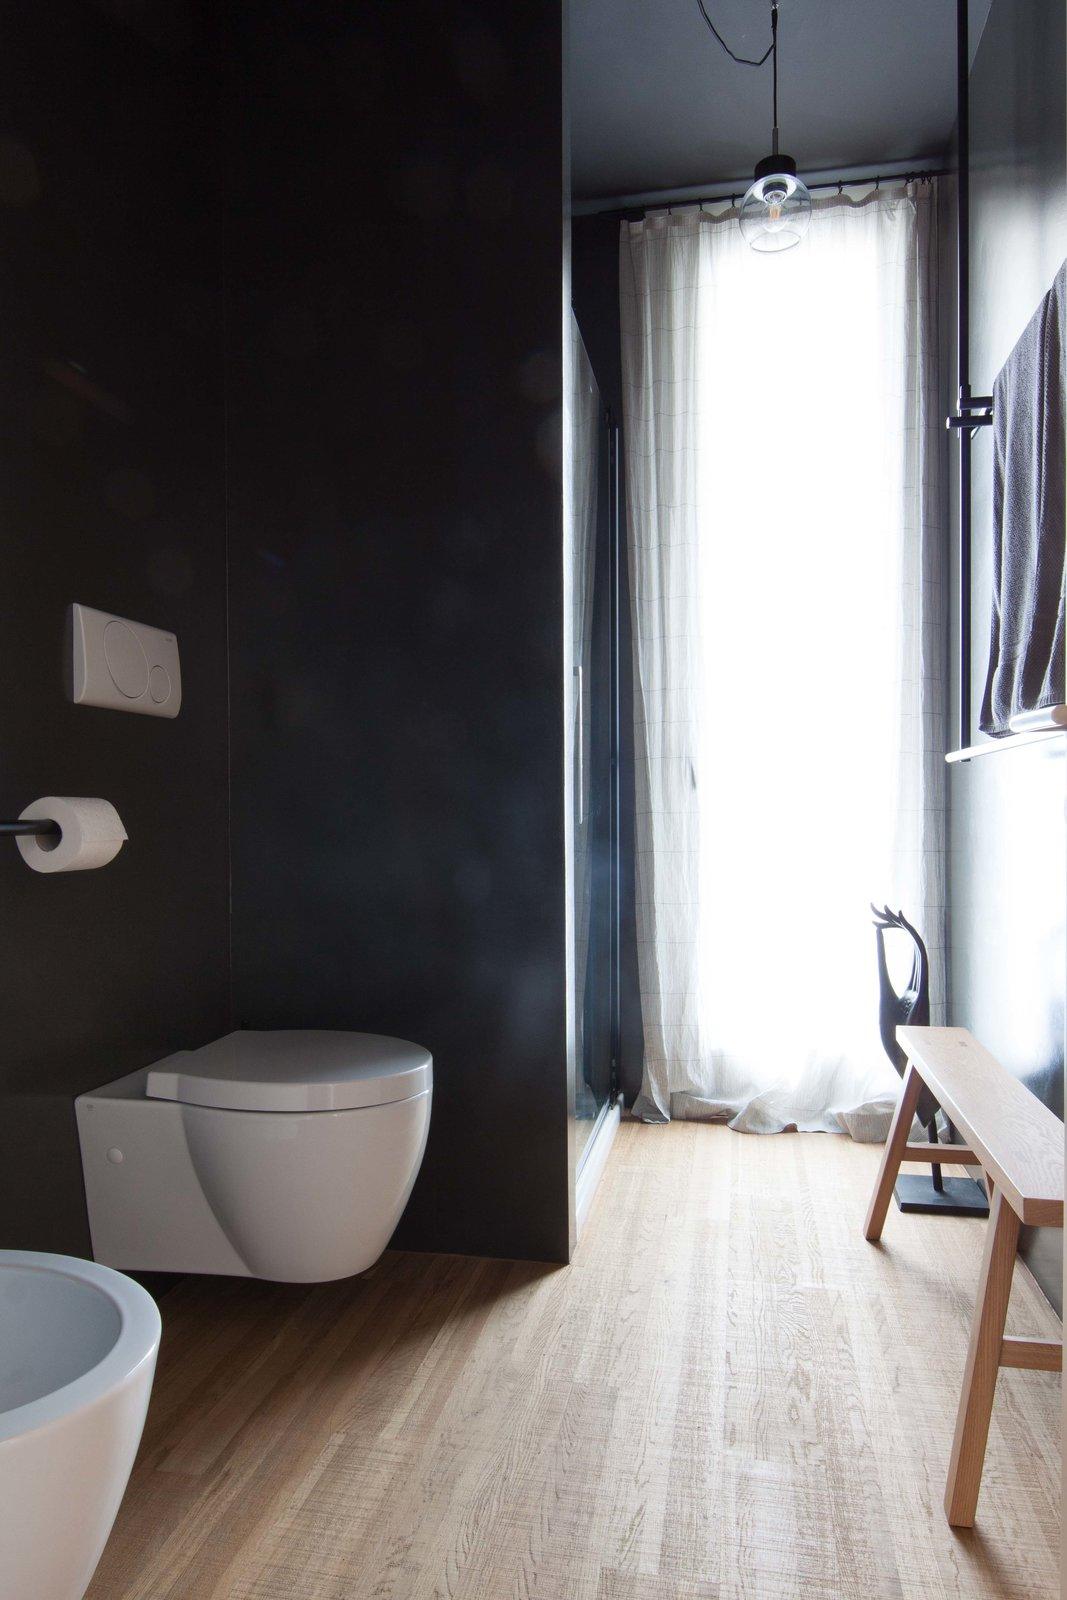 Bath Room, Medium Hardwood Floor, Pendant Lighting, Enclosed Shower, Concrete Wall, and One Piece Toilet  Interior LP by Didonè Comacchio